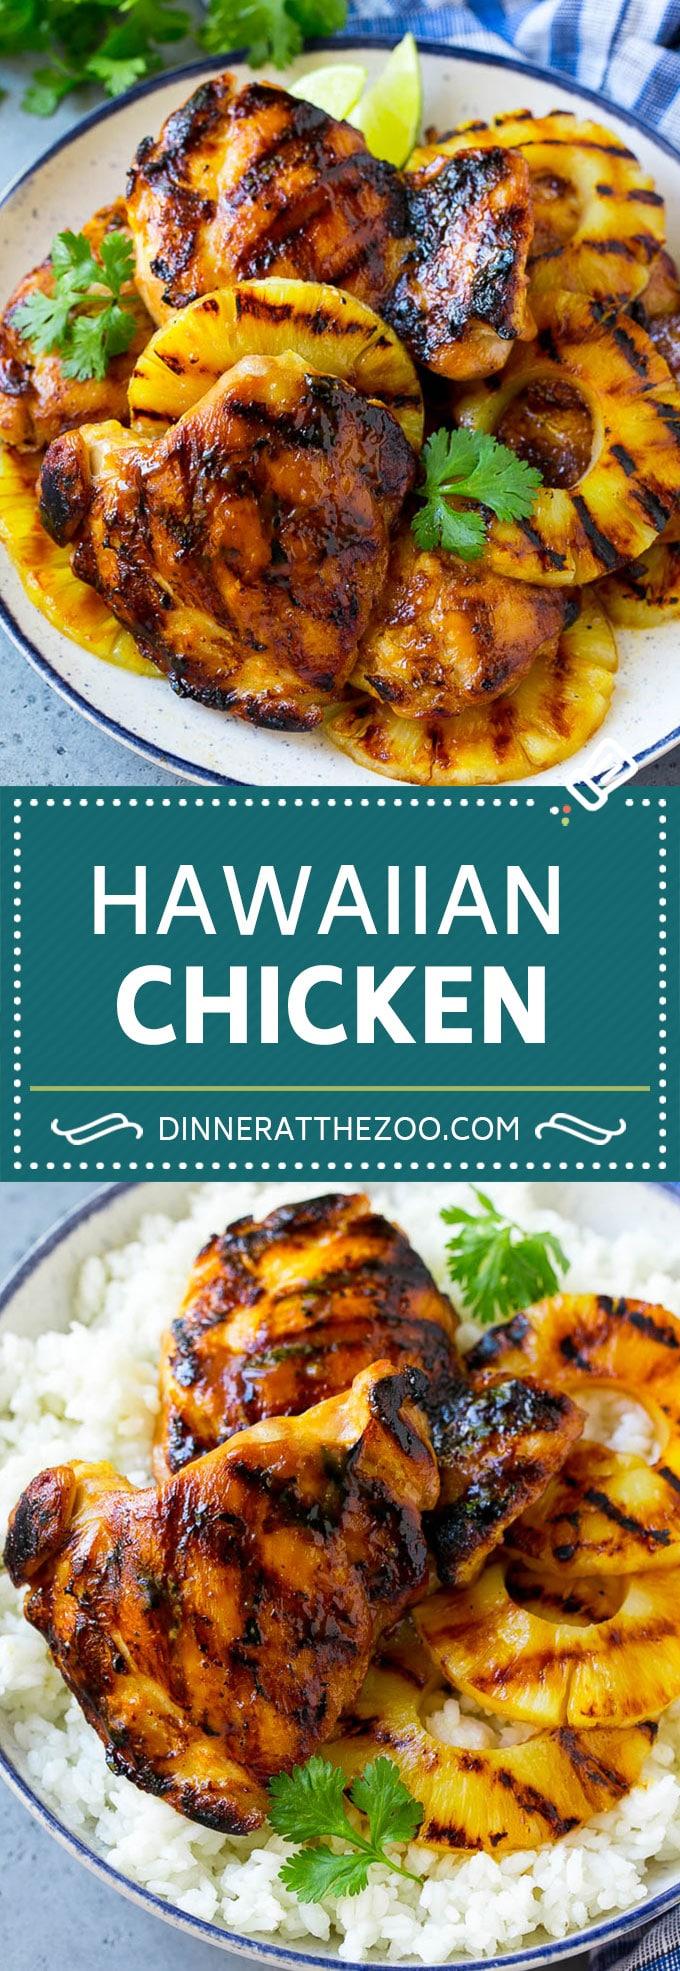 Receta de pollo hawaiano |  Pollo a la parrilla |  Pollo con piña #pollos # grill # cena #ananas #dinneratthezoo